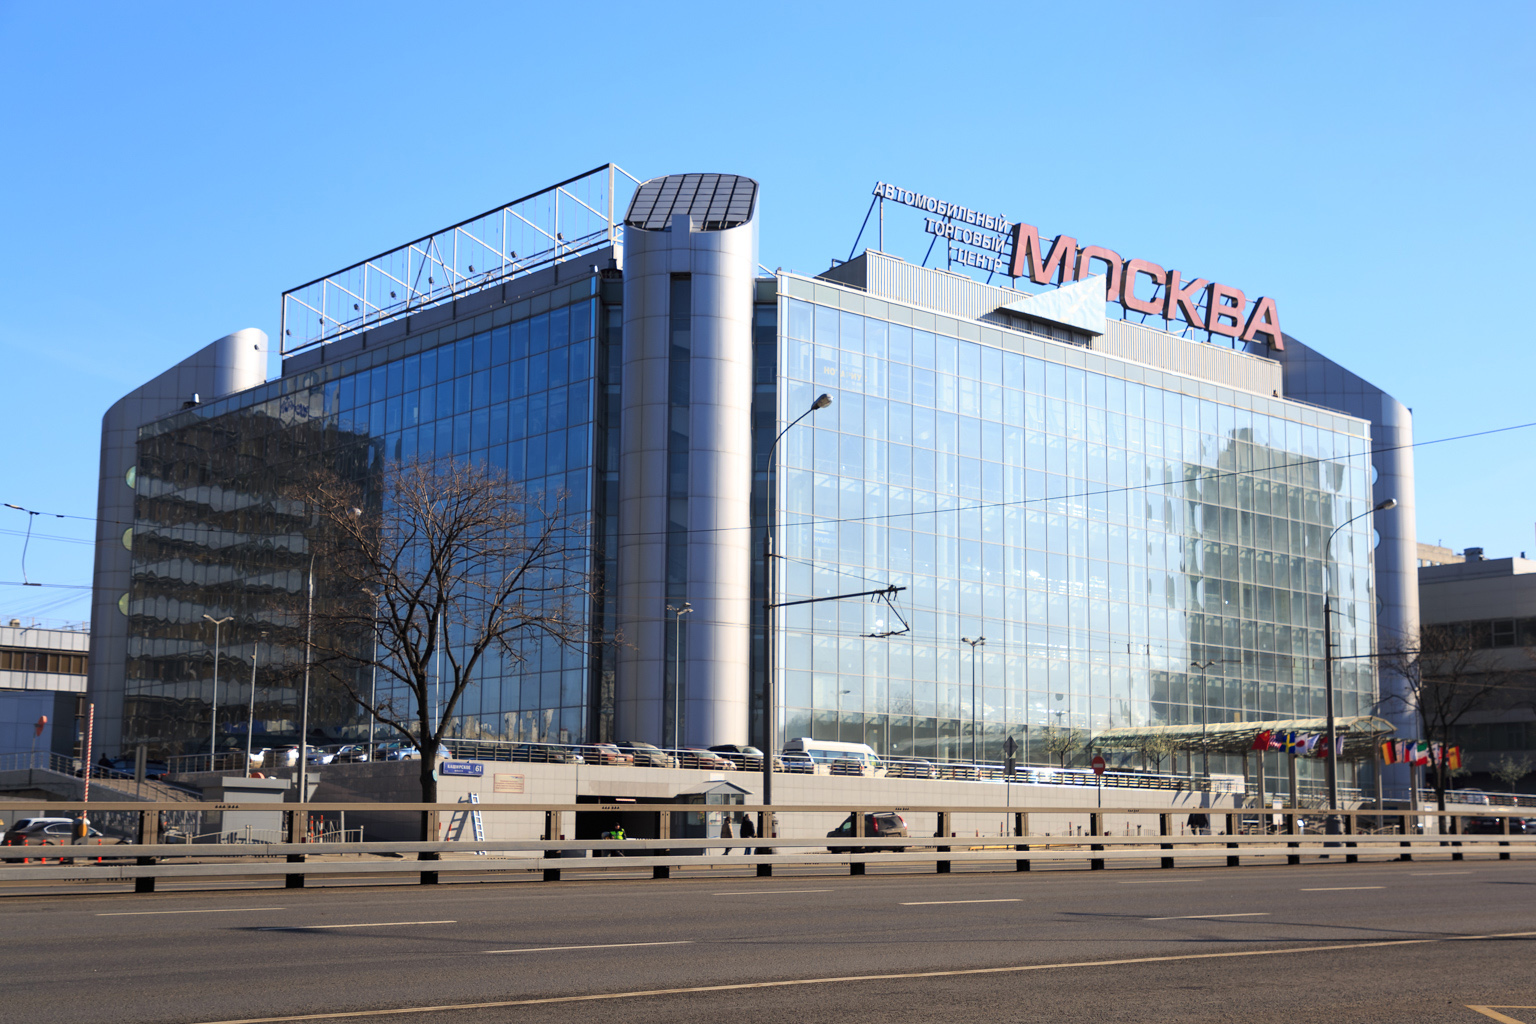 Атц москва автосалон каширское шоссе автосалоны шкода в москве вакансии